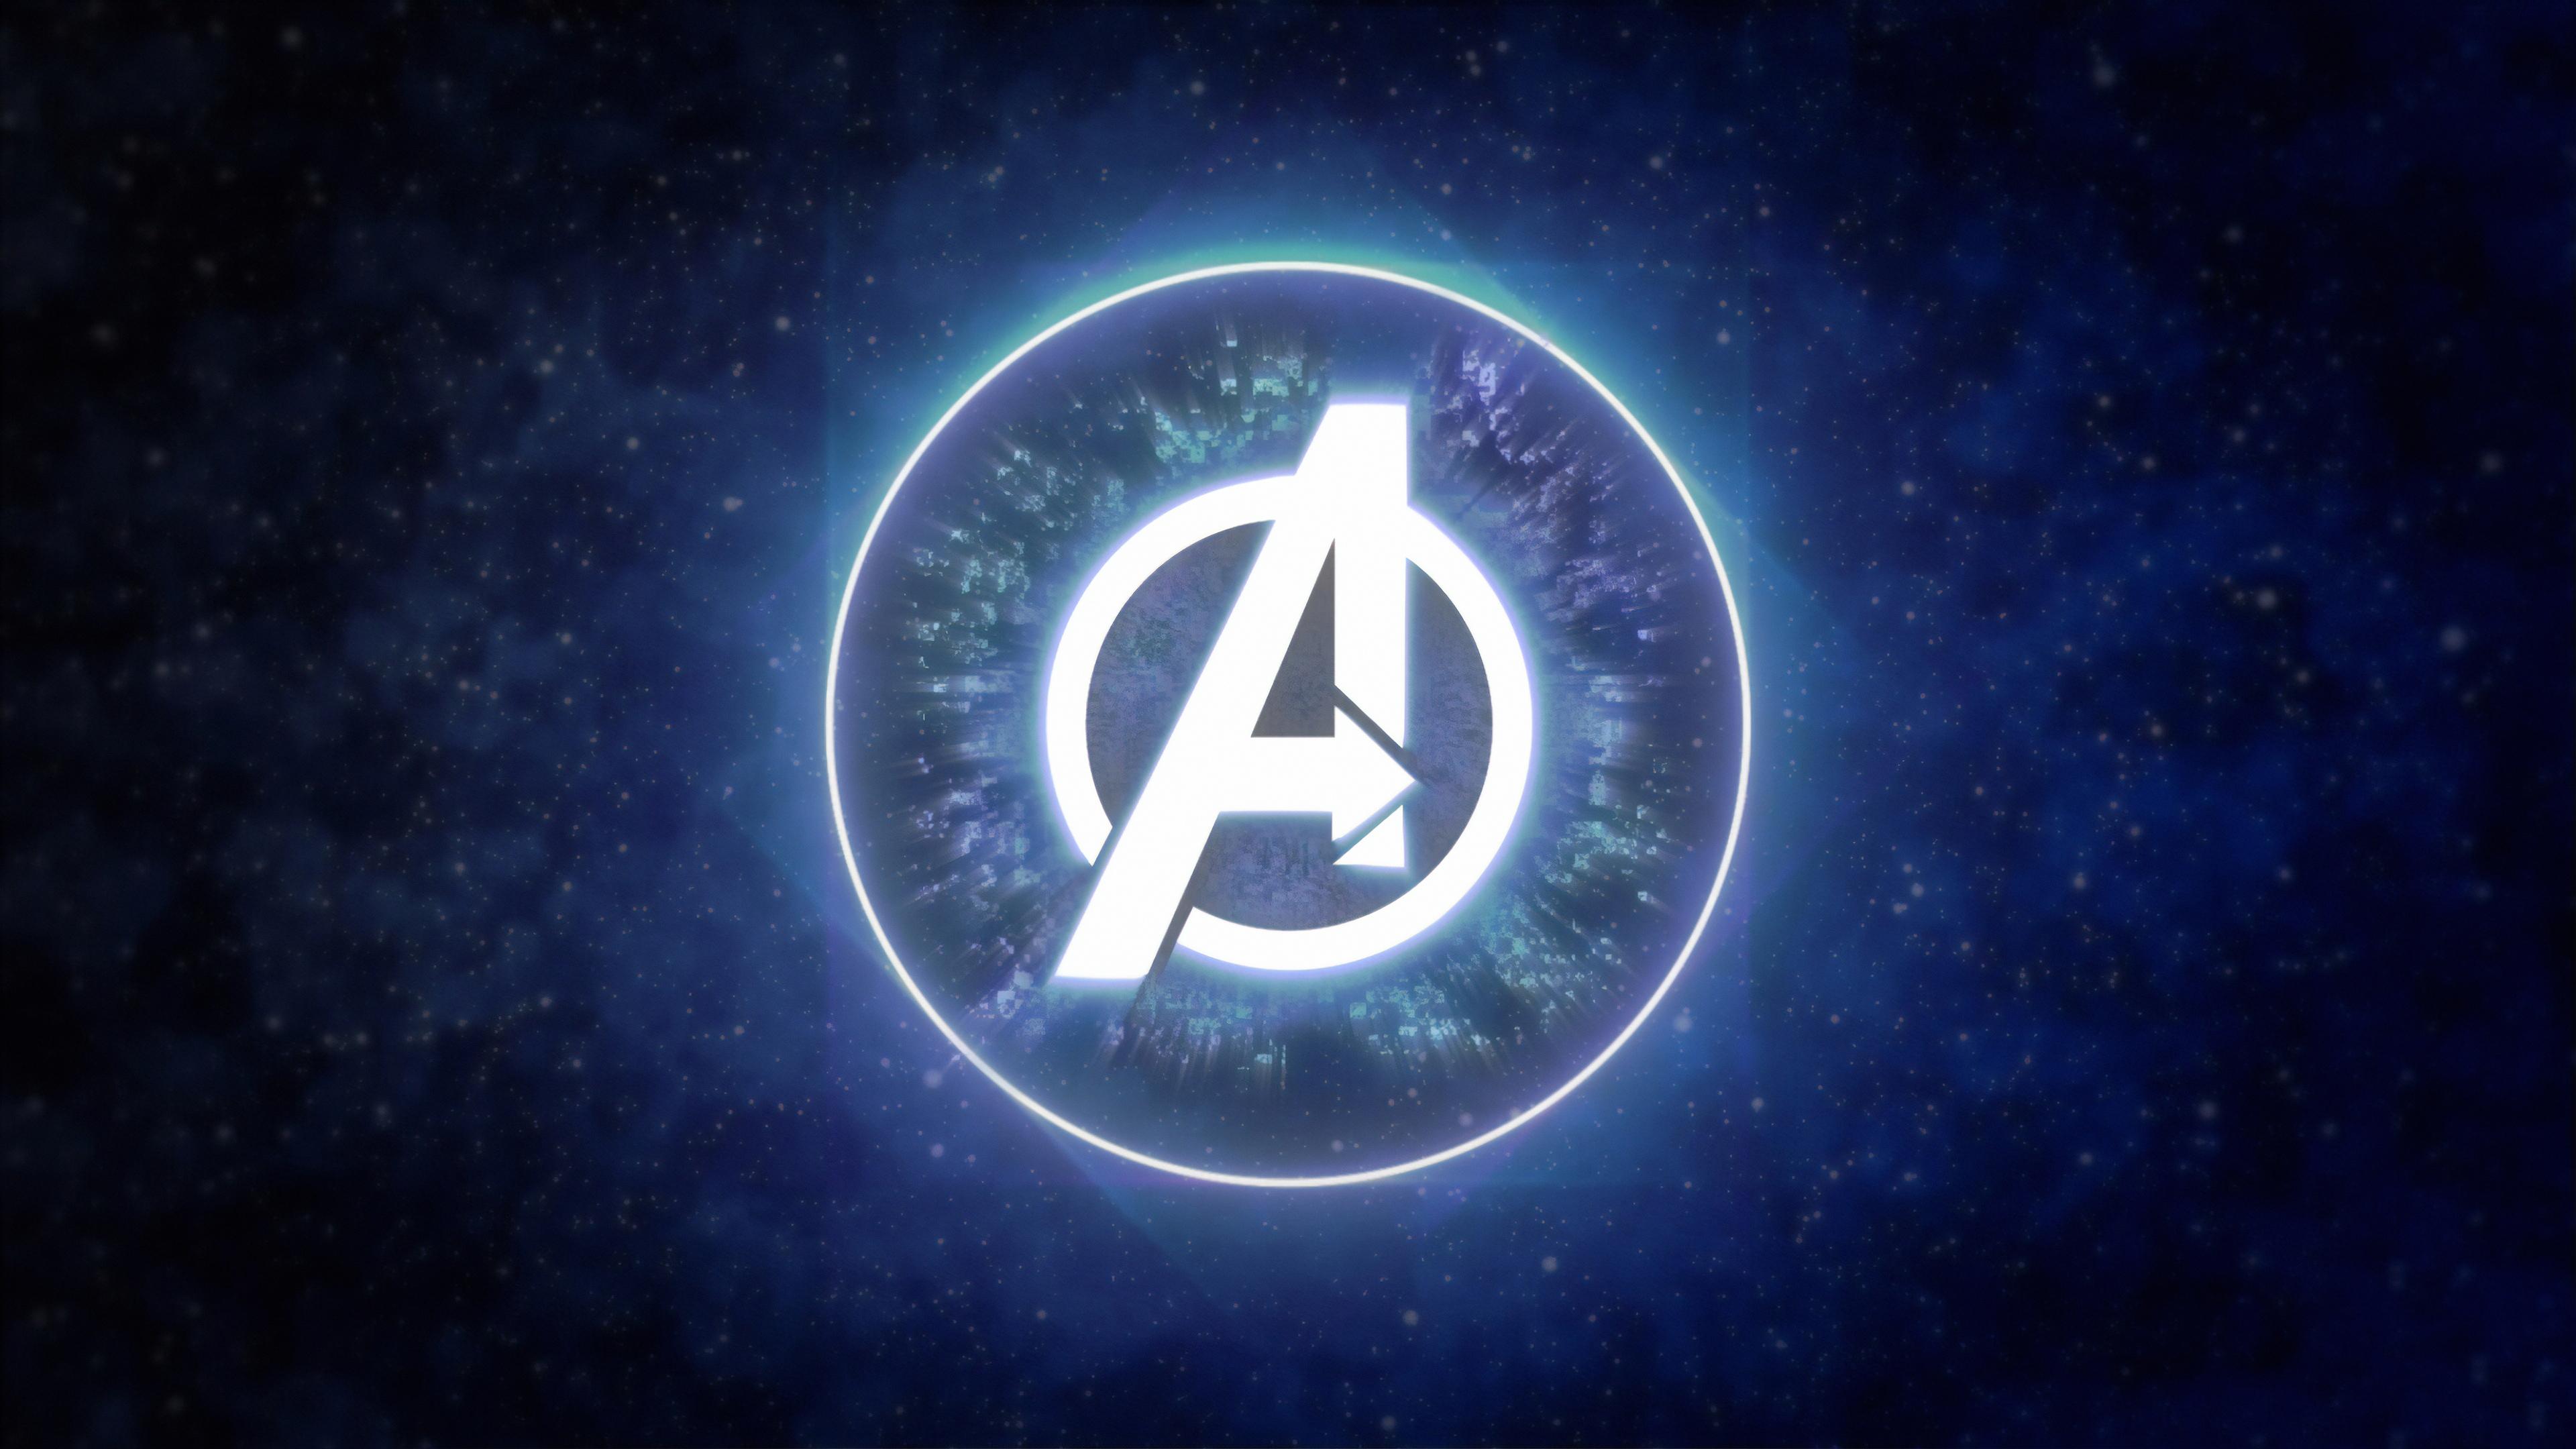 Avengers Logo 4k, HD Superheroes, 4k Wallpapers, Images.